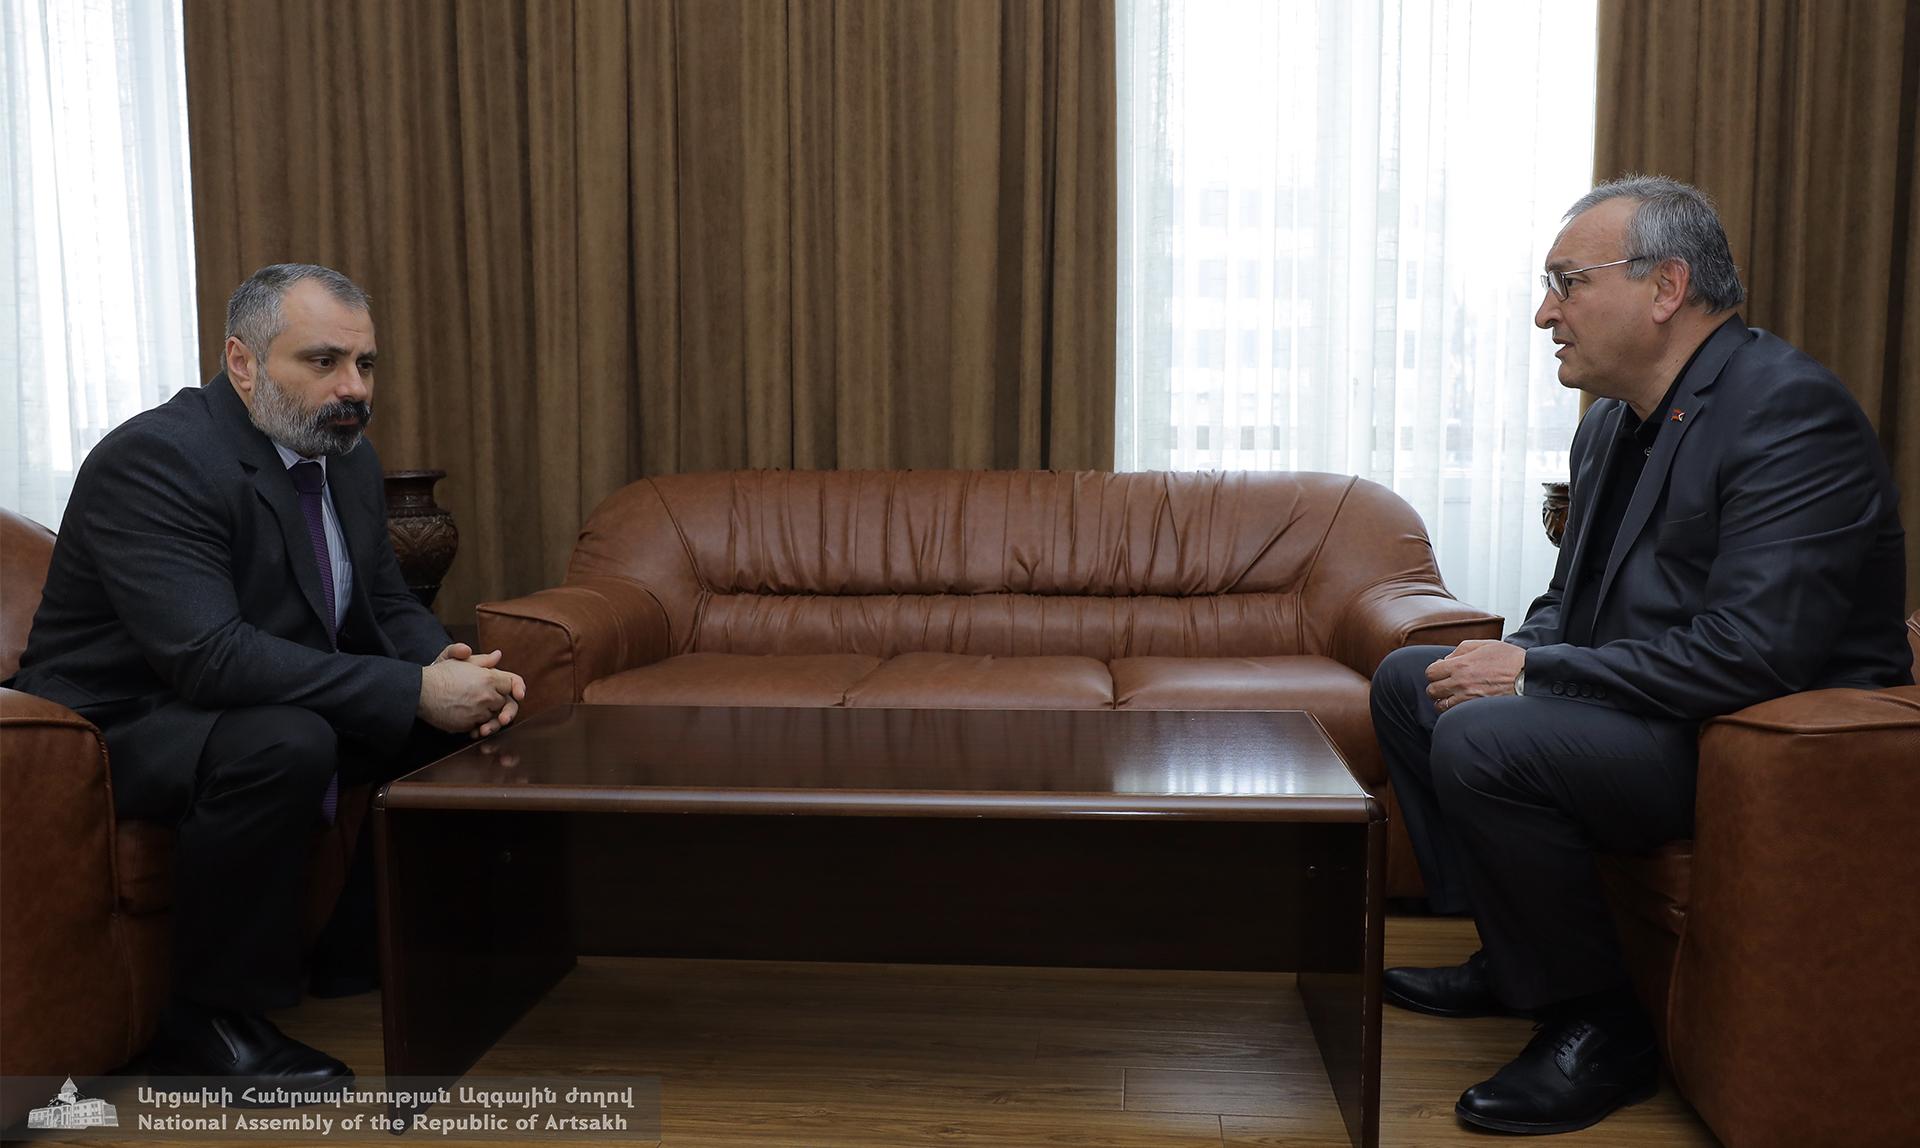 Photo of Արթուր Թովմասյանը հանդիպել է ԱԳ նախարար Դավիթ Բաբայանի հետ